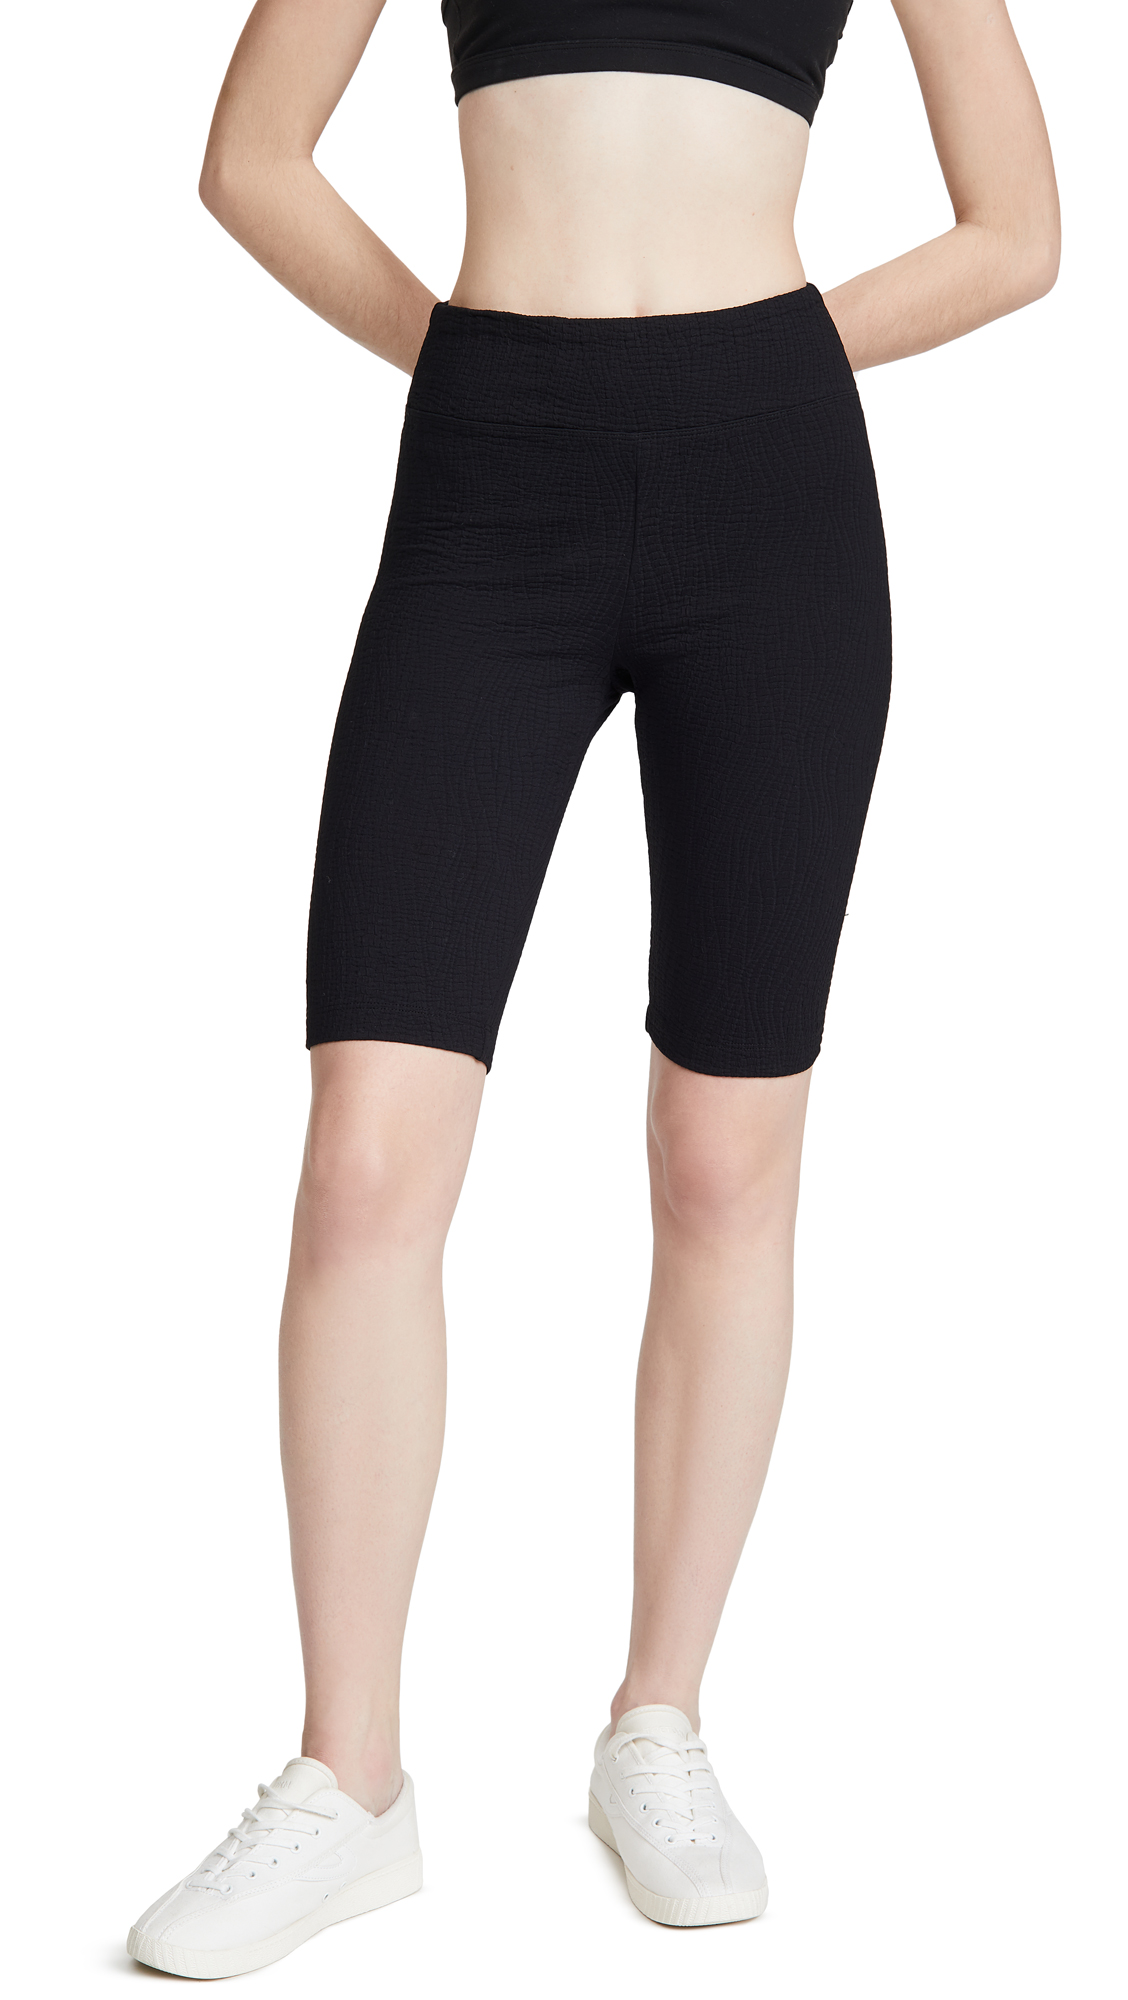 Buy KORAL ACTIVEWEAR online - photo of KORAL ACTIVEWEAR Densonic Flora High Rise Bike Shorts